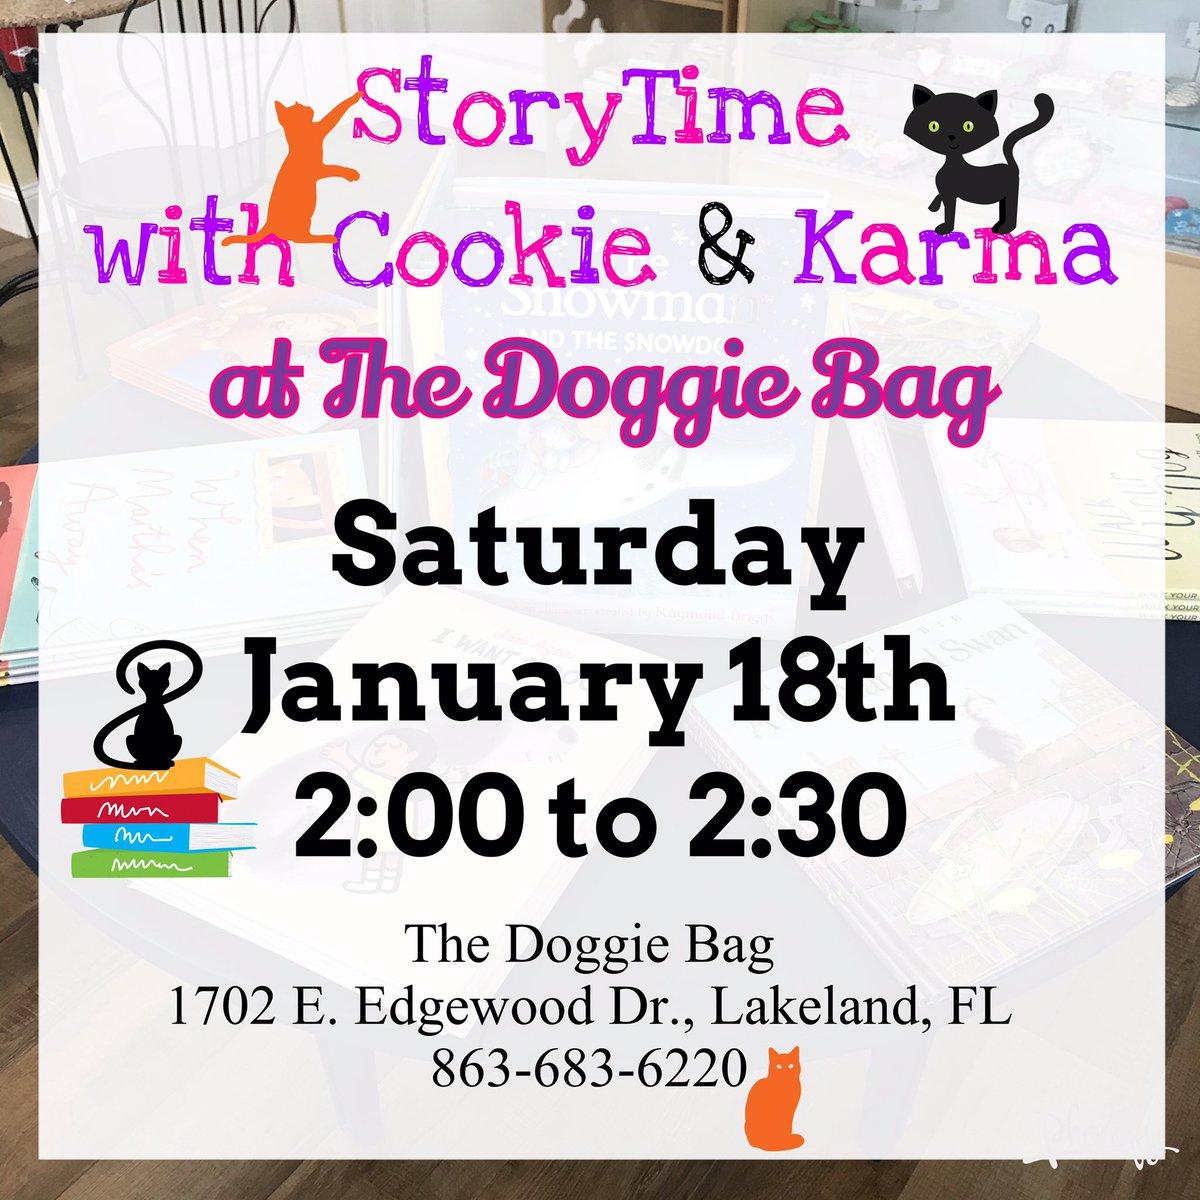 StoryTime with Cookie & Karma at The Doggie Bag... This Saturday!  #storytime #cookiethecat #karmathecat #shopcats #toddler #preschooler #childrensbooks #kidsbooks #lakelandmoms #thedoggiebag #lakelandflorida #lakelandfl #lakelandeventspic.twitter.com/hGbzQMmdeL